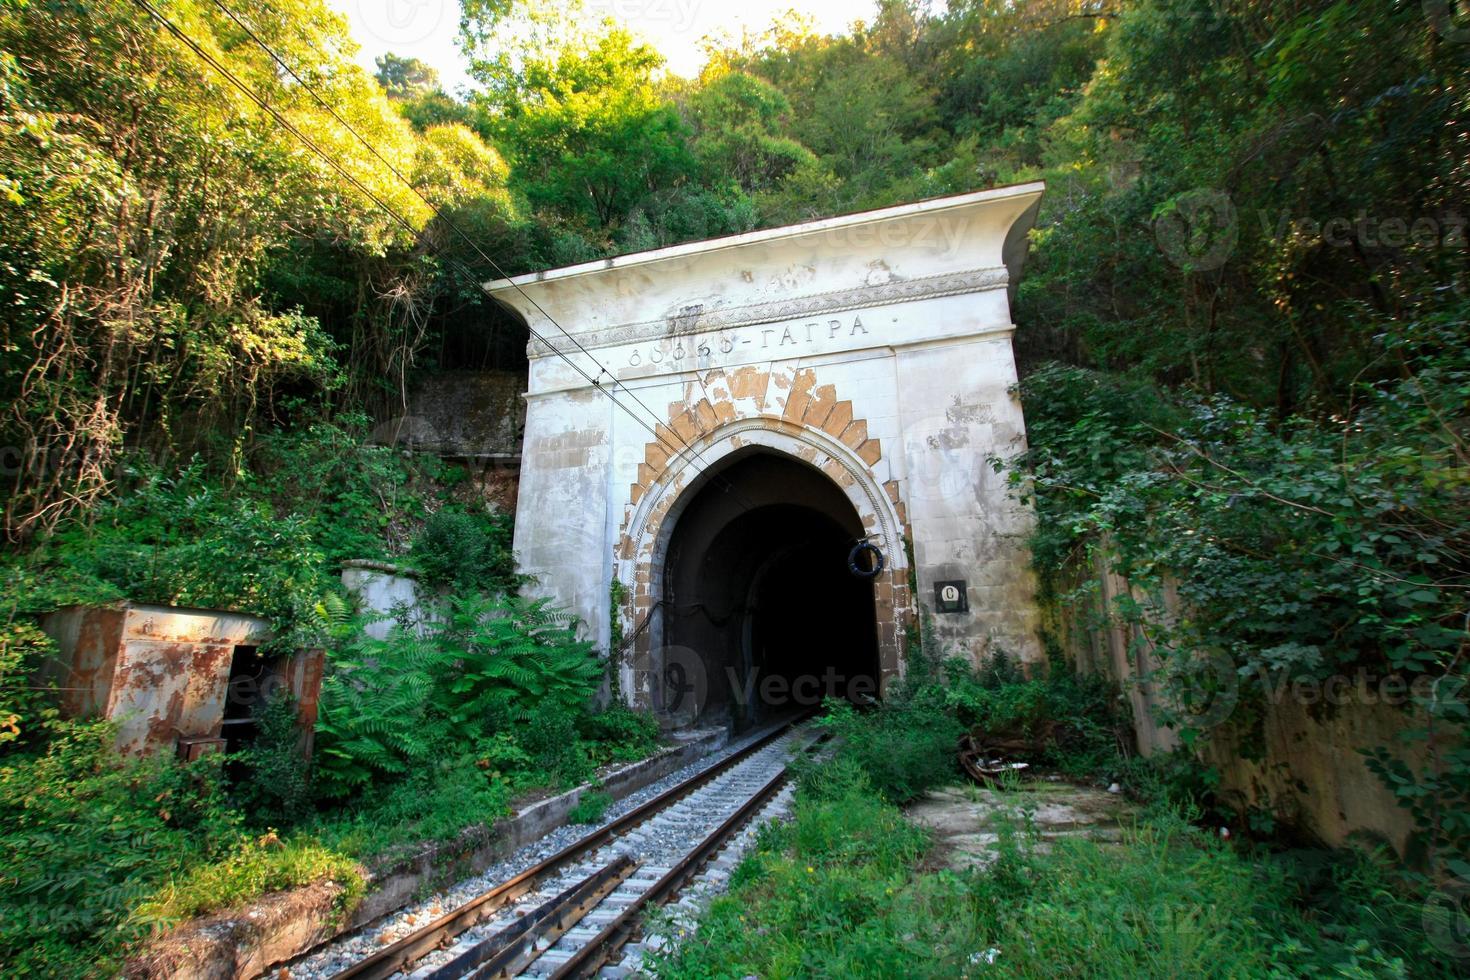 The portal in railway tunnel in the jungle photo